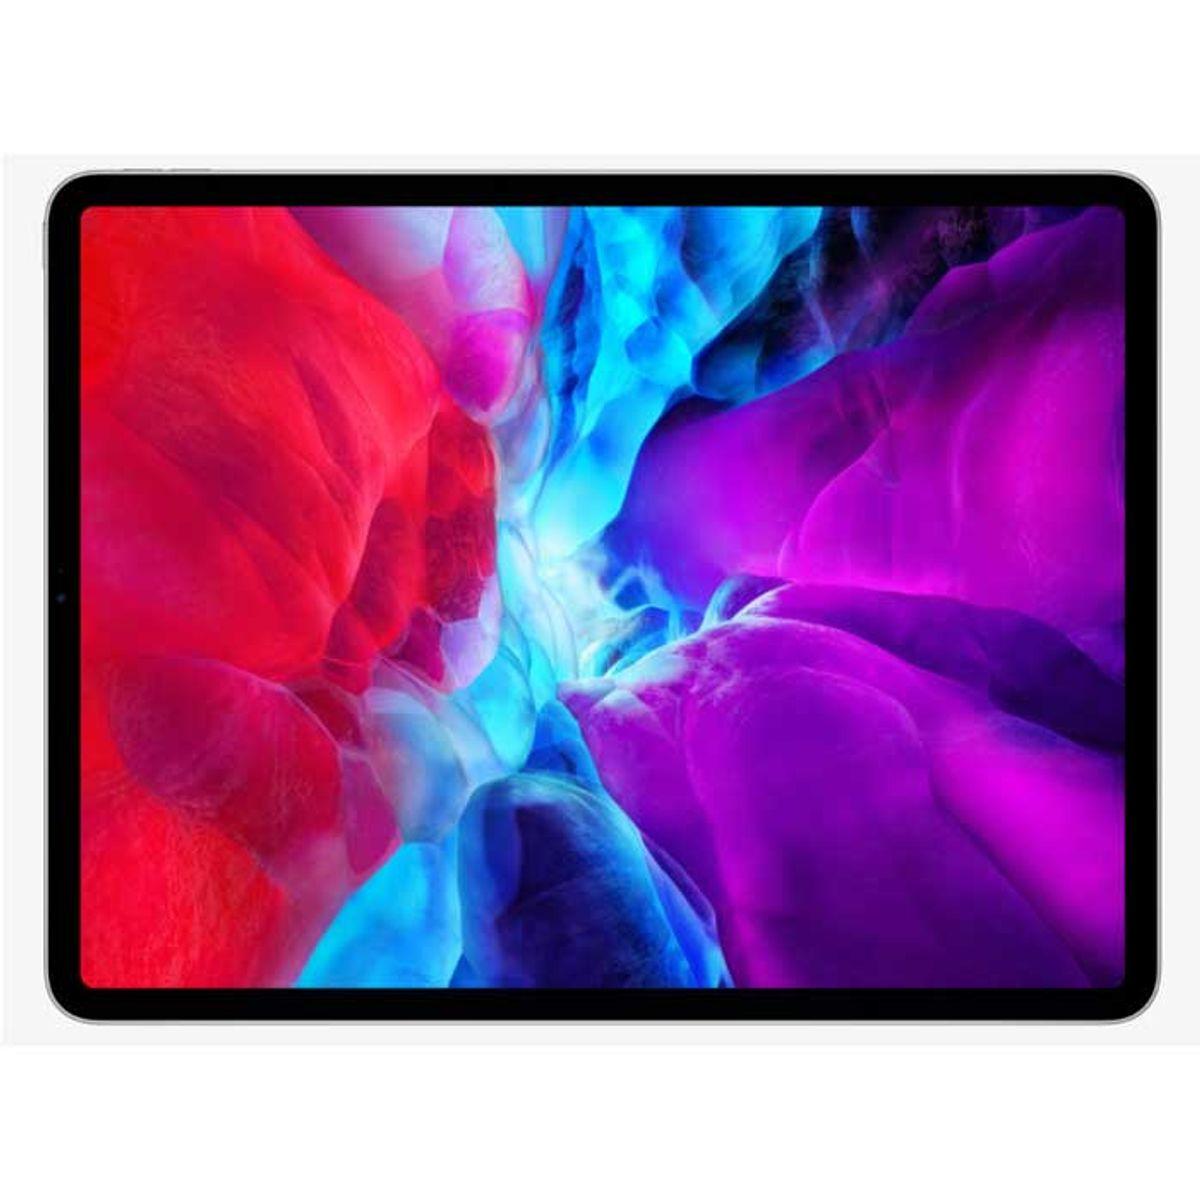 iPad Pro 12.9‑inch